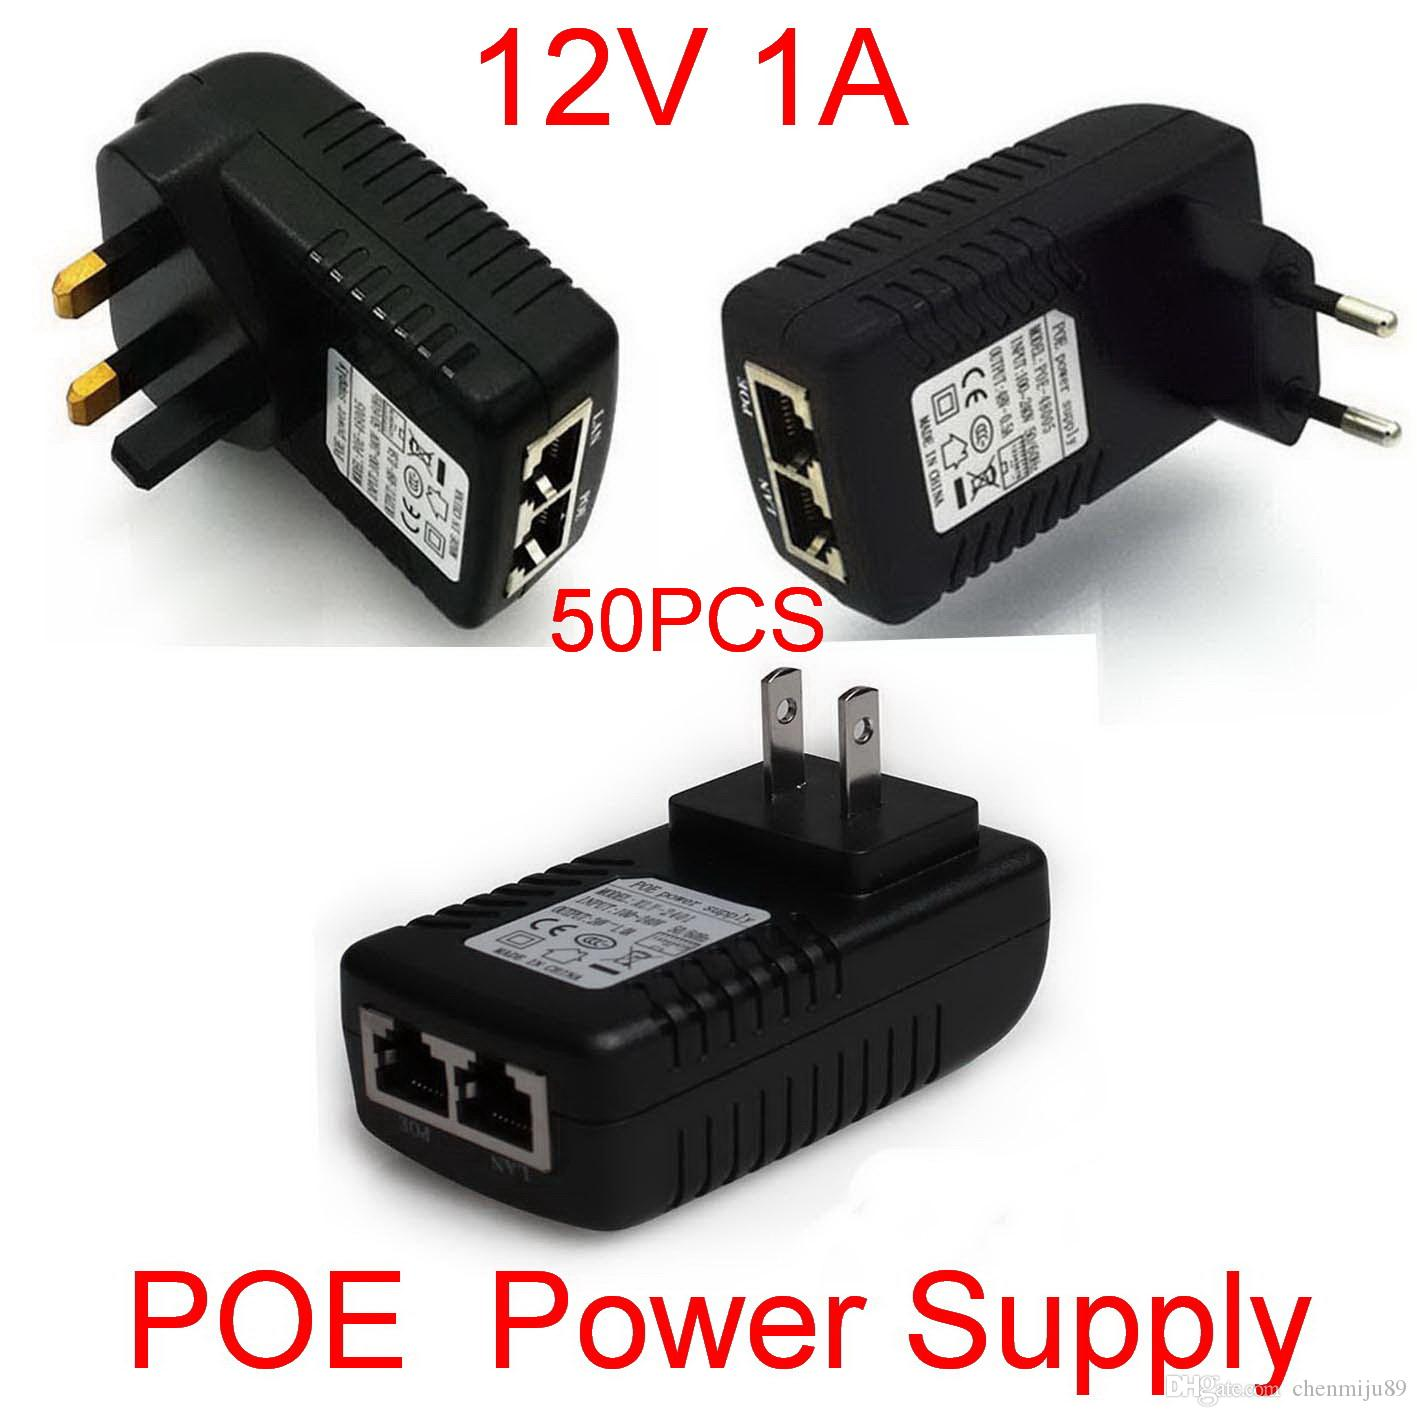 Iec Power Cord Wiring Free Download Wiring Diagram Schematic